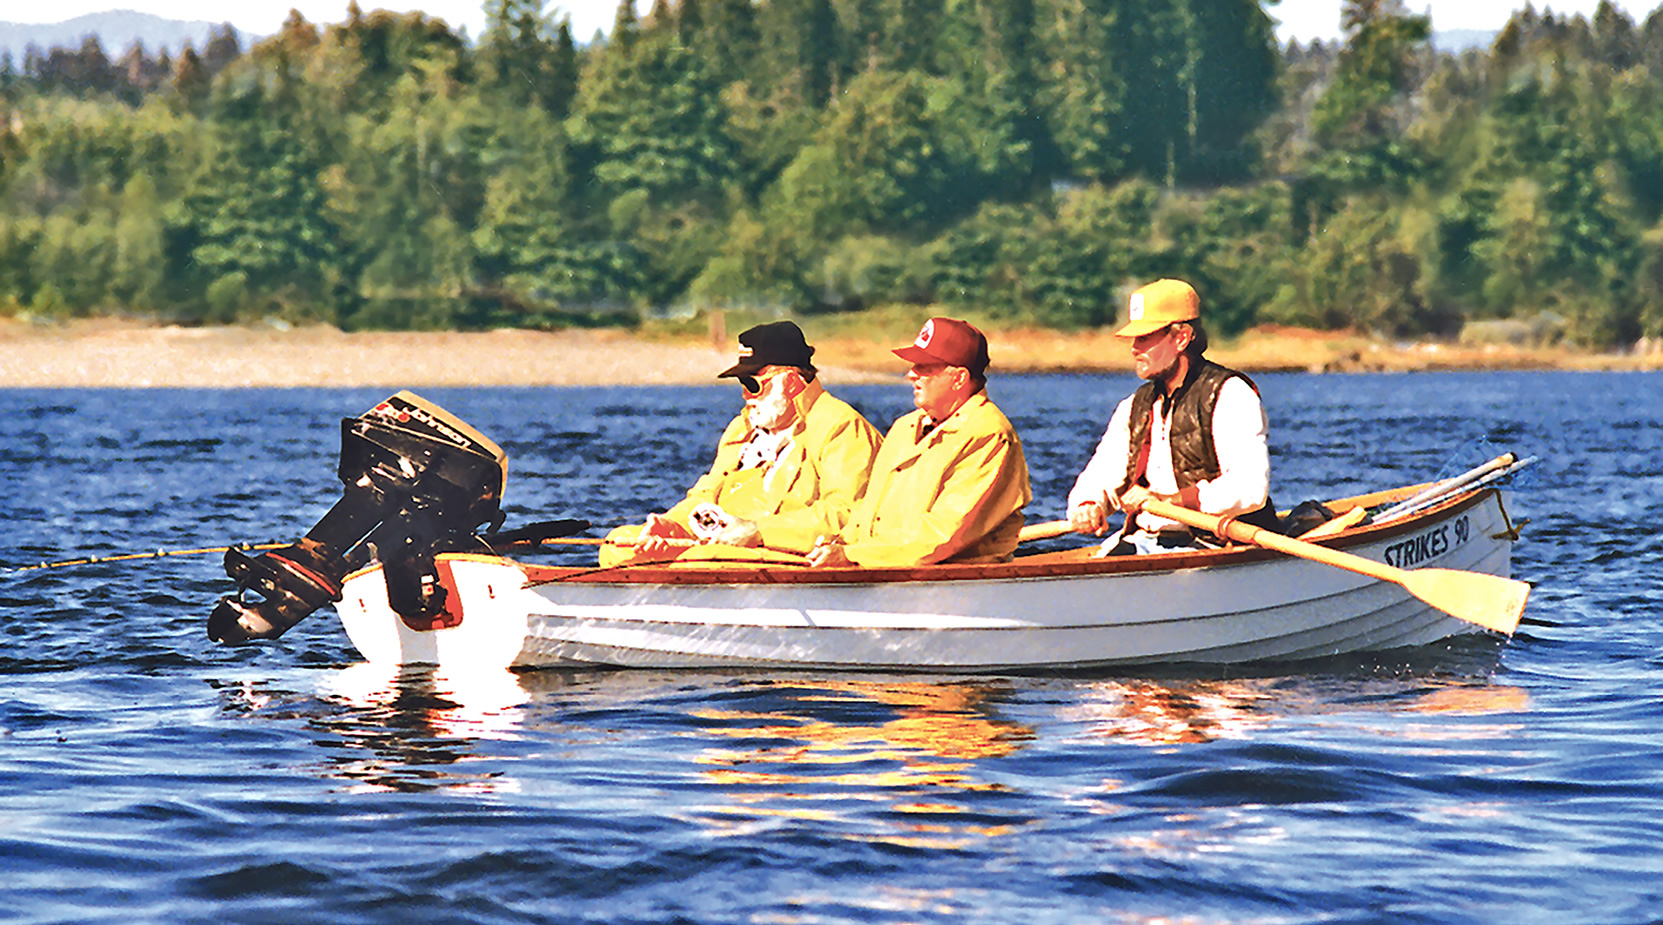 whitehall-tyee-spirit-14-fishing-rowing-boats